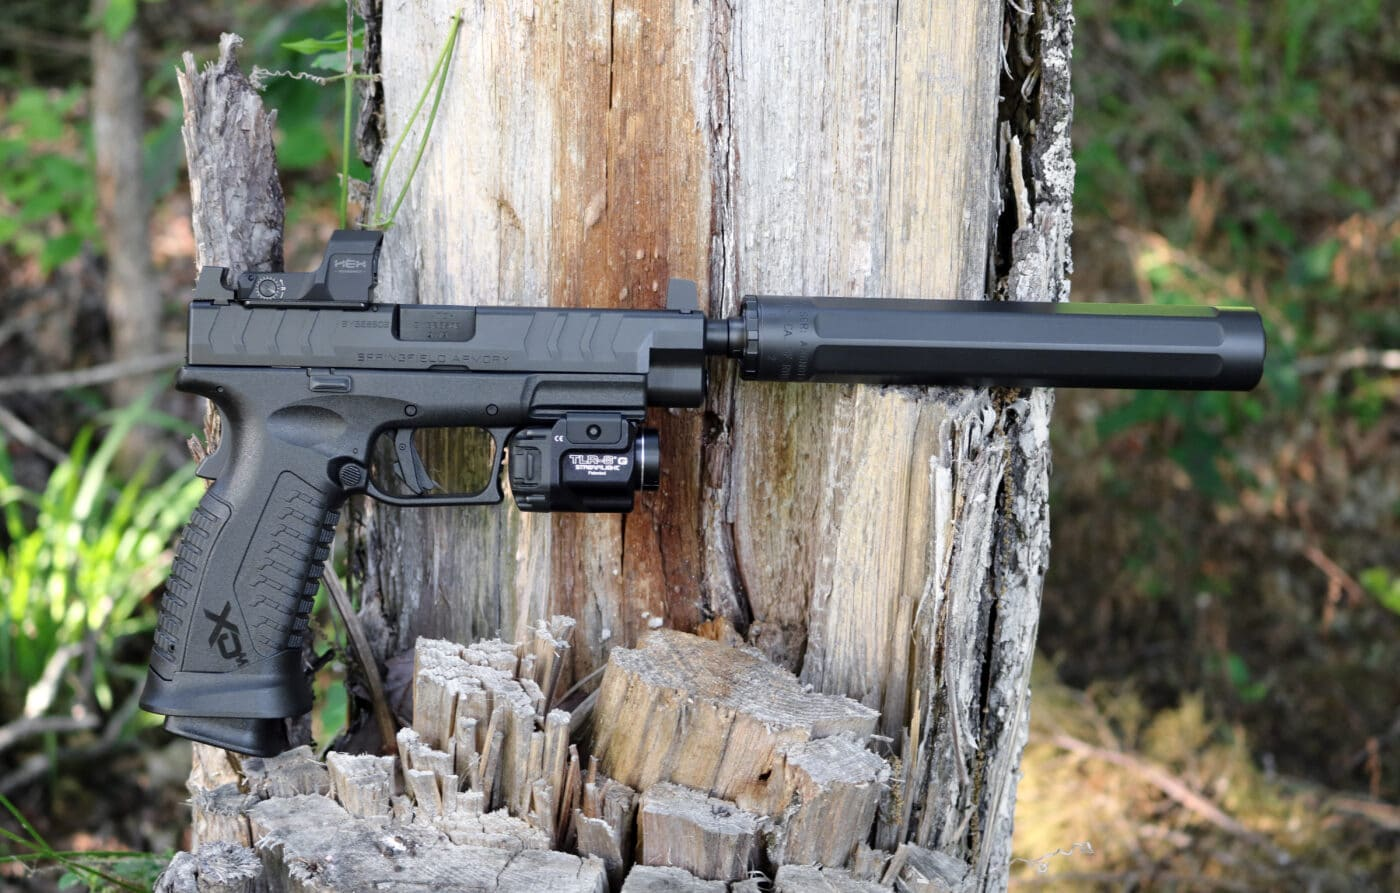 Surefire Ryder 9-Ti2 Sound Suppressor on an XD-M Elite OSP pistol